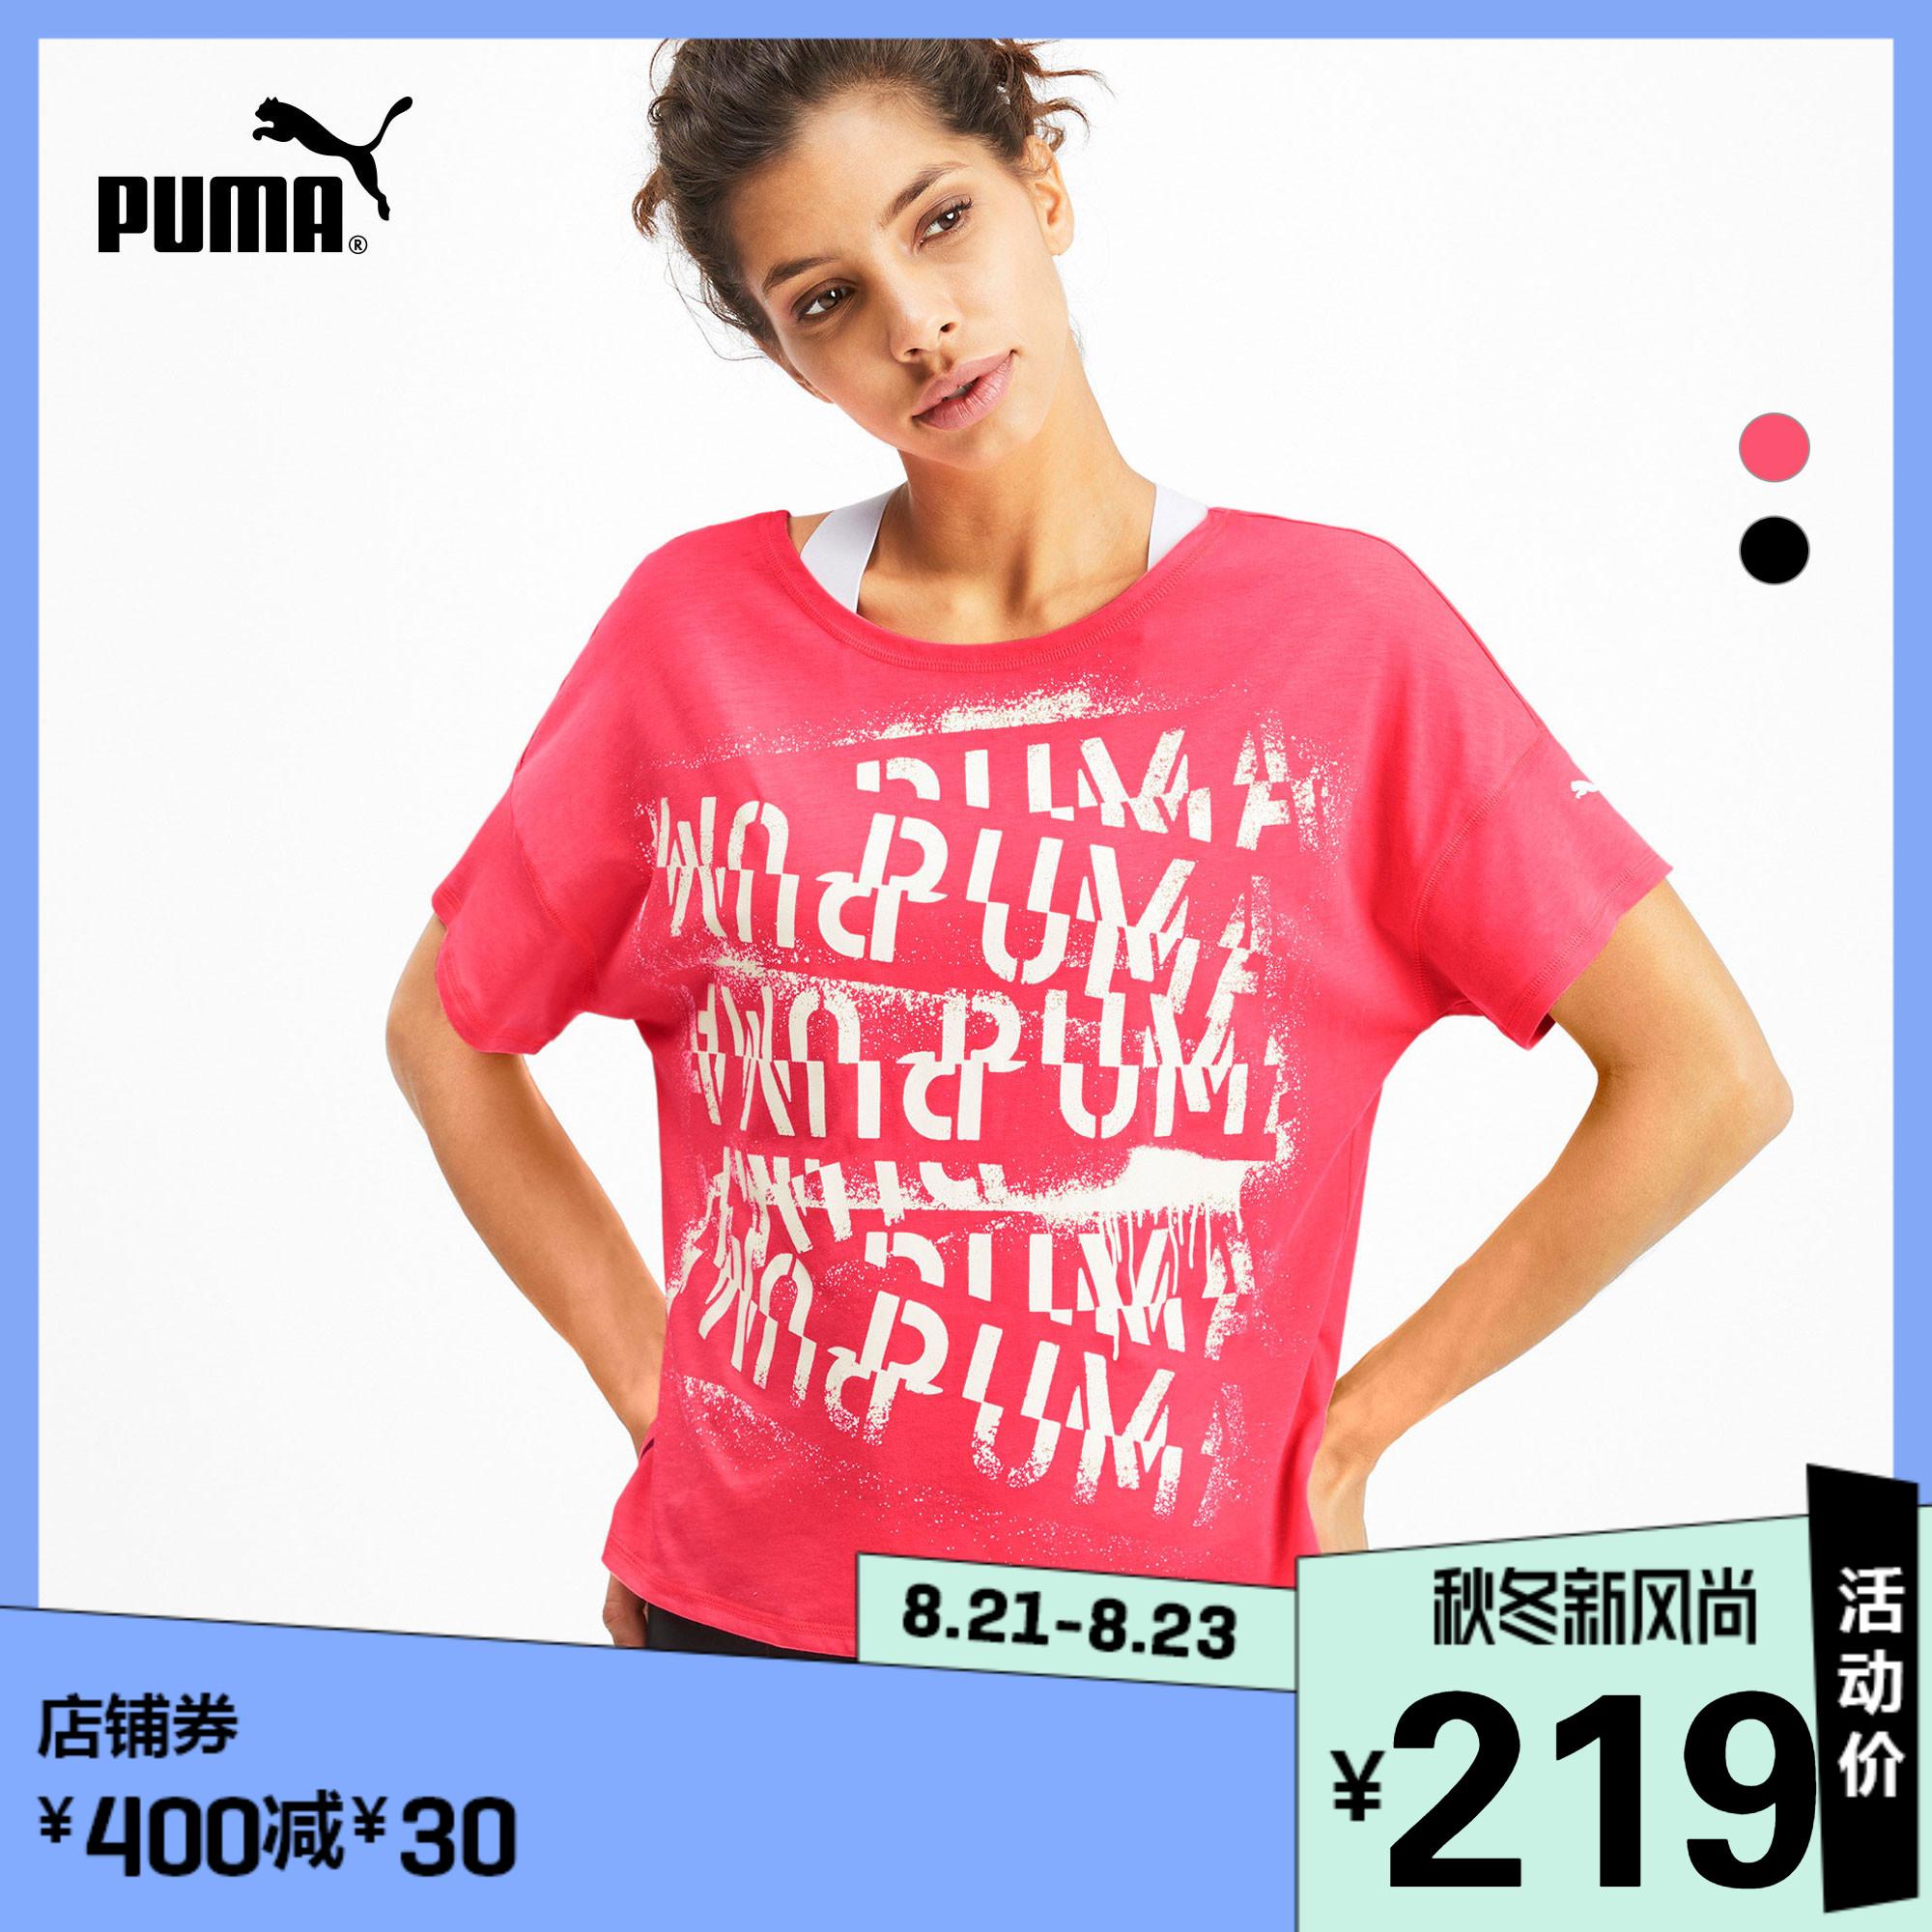 PUMA彪马官方正品 春夏女子短袖T恤HIT Feel It 518319